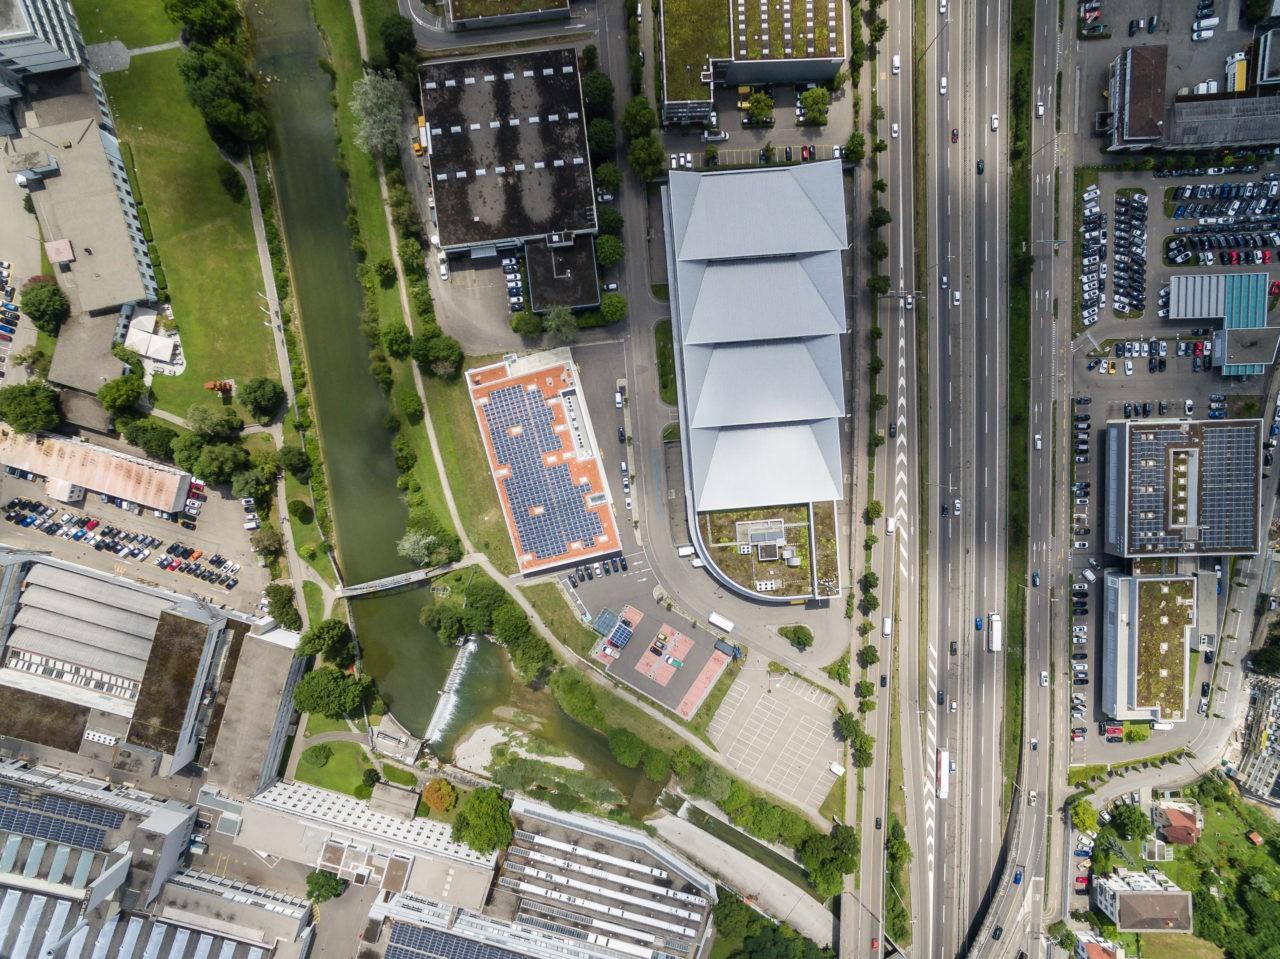 MAS Raumplanung 2019/21. Bild: Timon Furrer, ETH Zürich